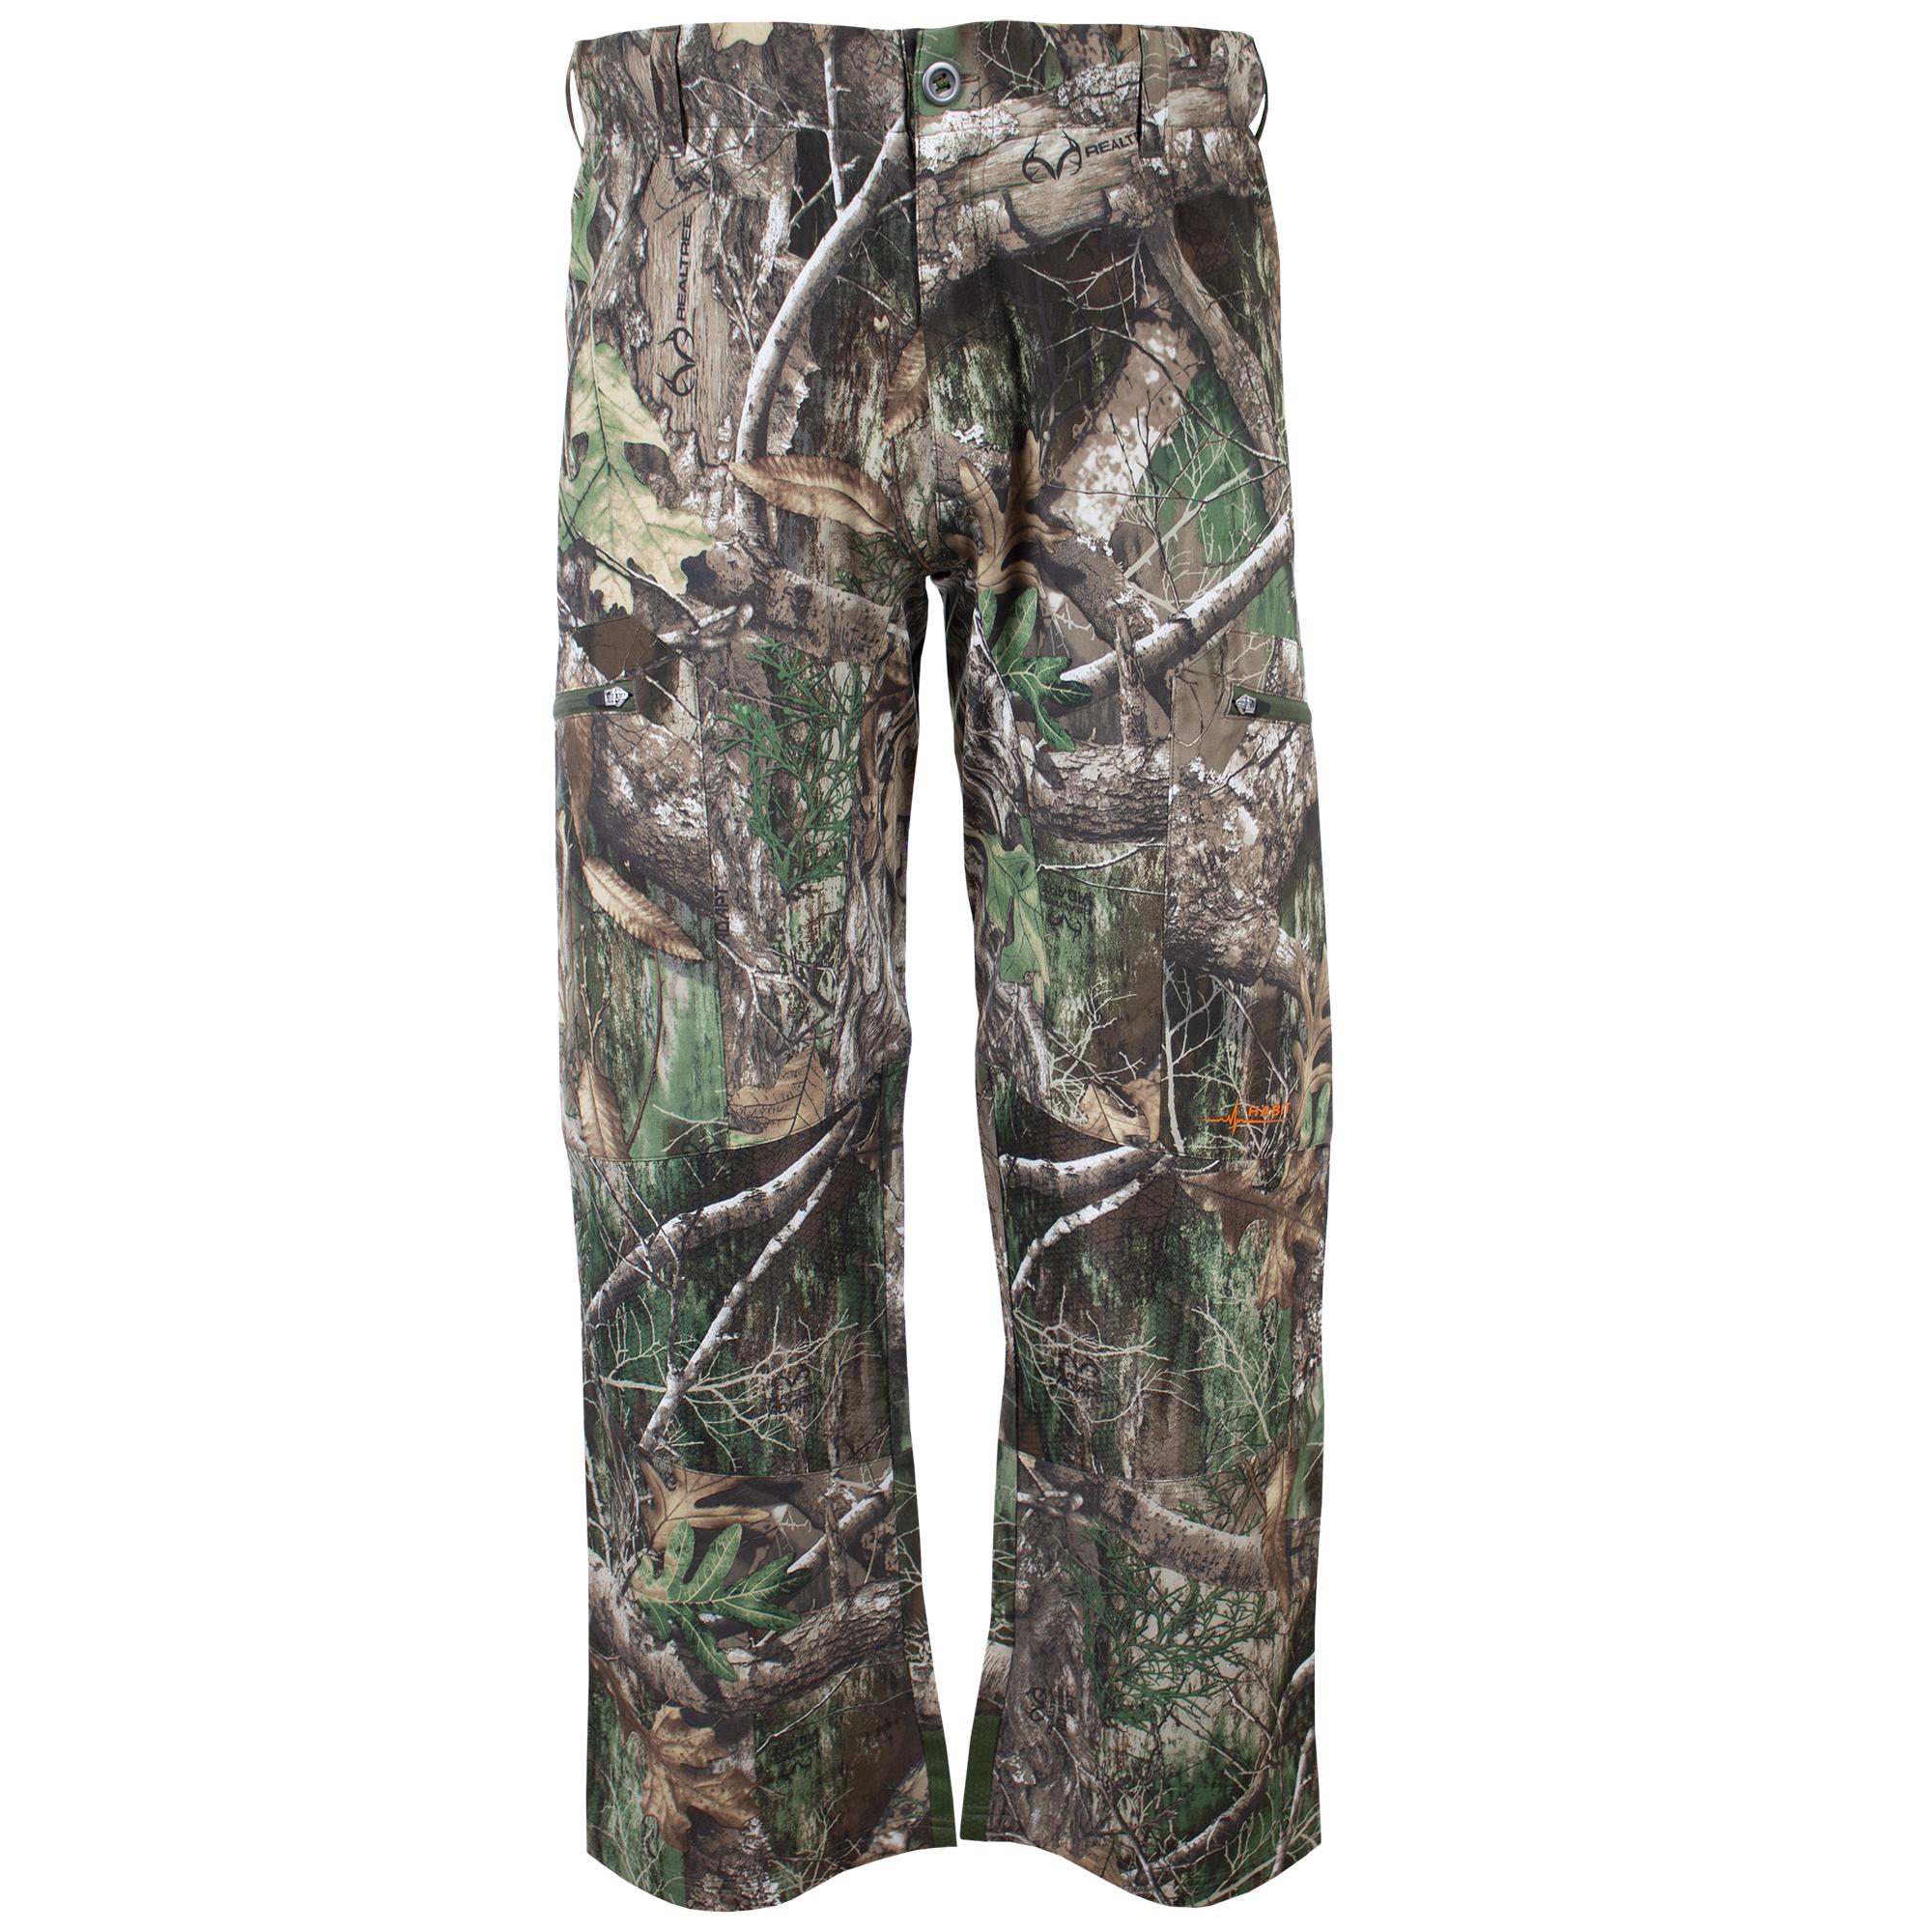 Habit Men's Turkey Ridge Camo Hunting Pant, Realtree Edge/Cub thumbnail